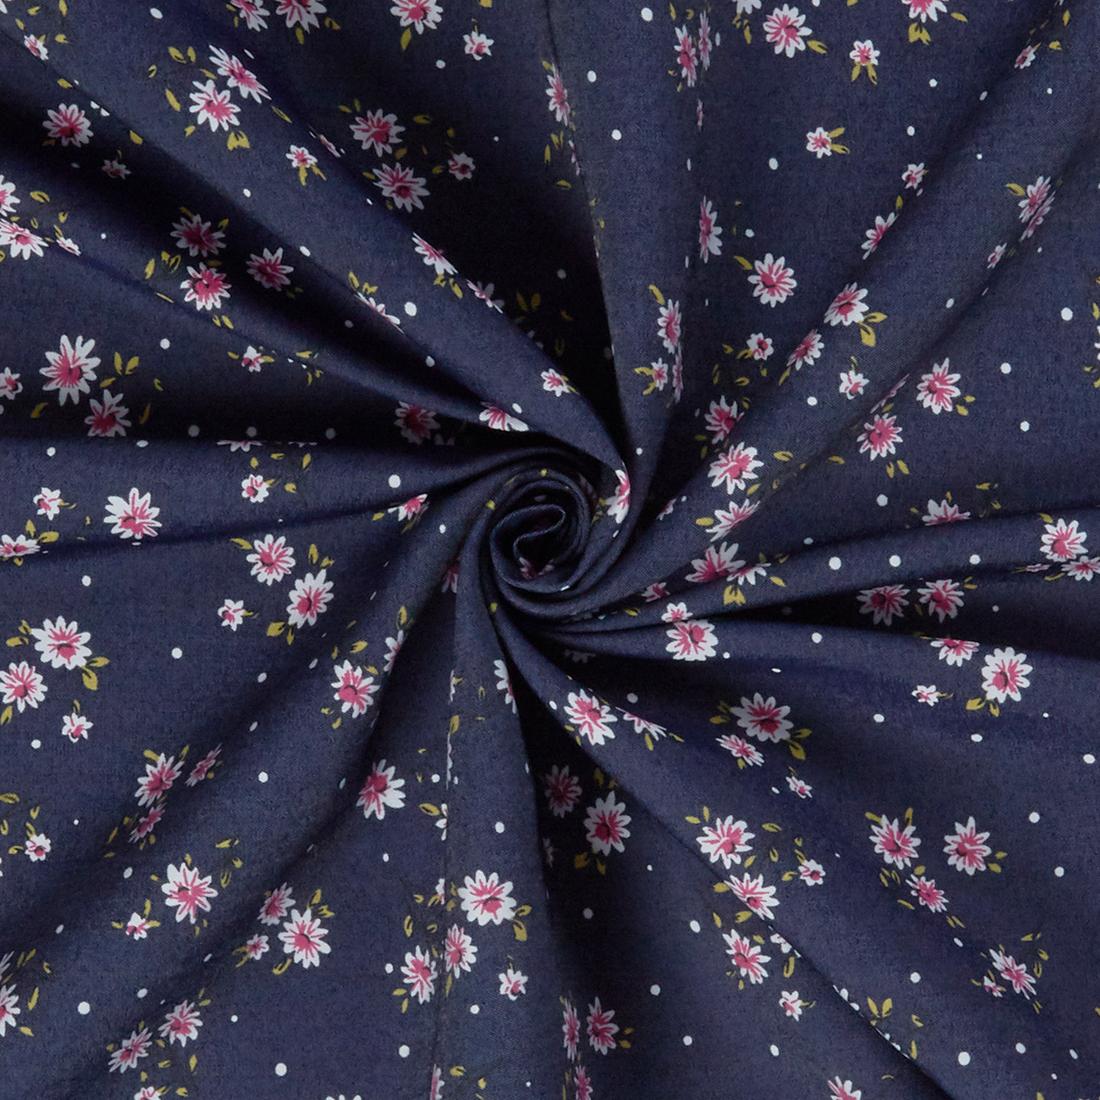 Floral Denim Dark Dress Fabric